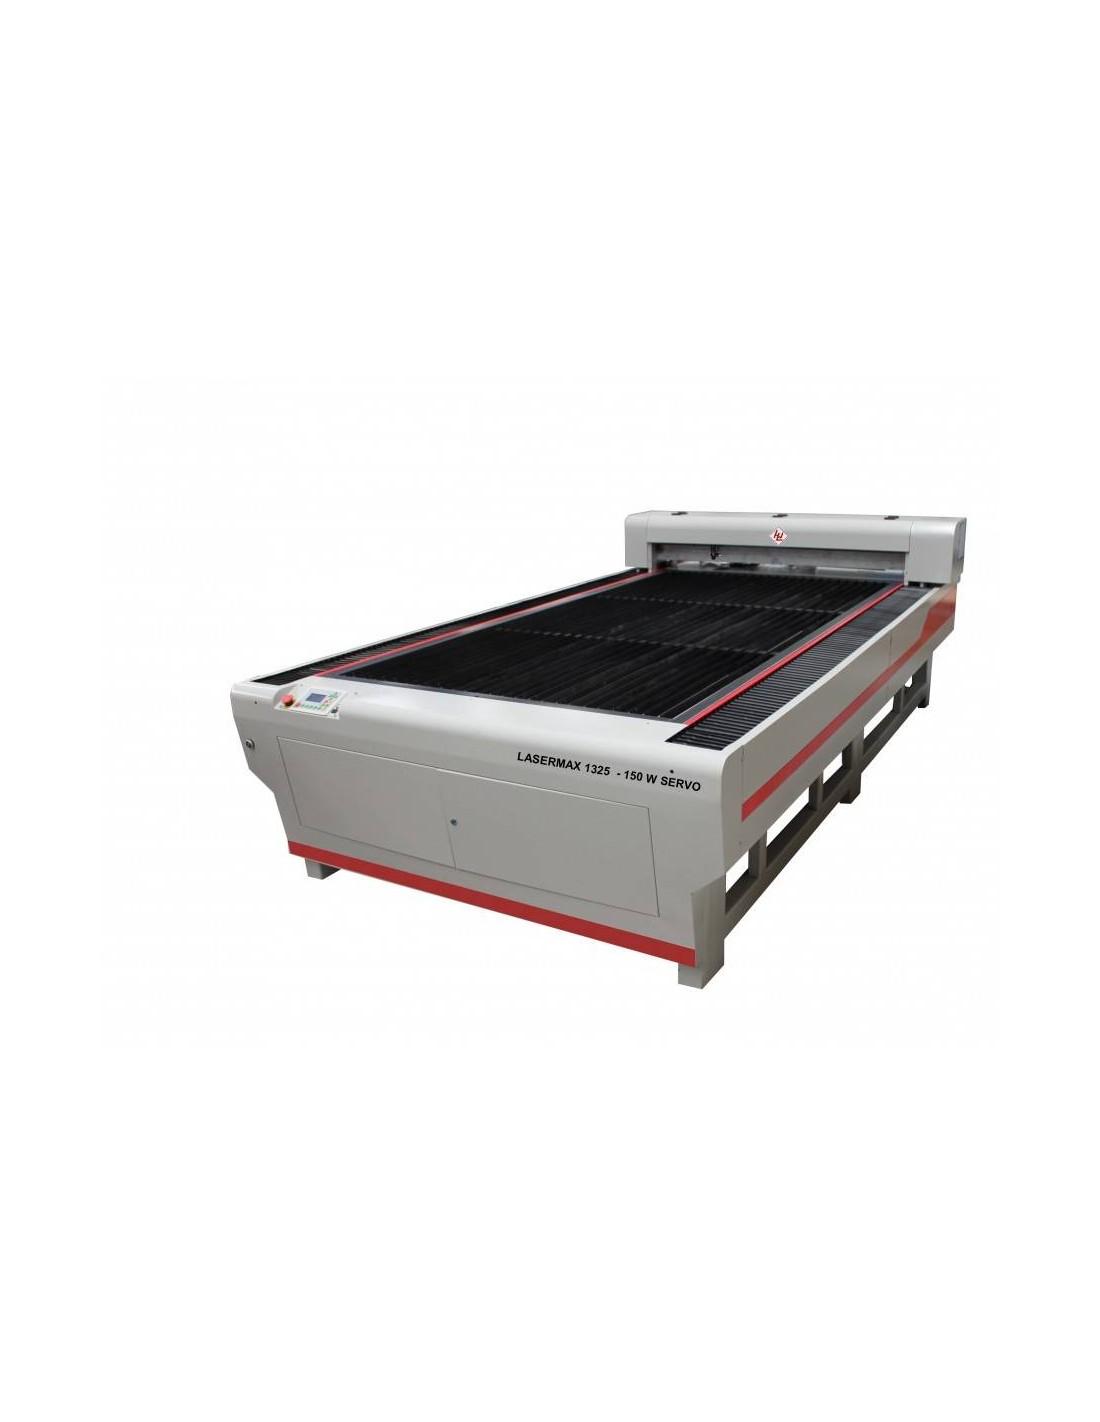 Masina de gravat si taiat cu laser CO2 Winter LaserMax Maxi 1325 - 150 W SERVO